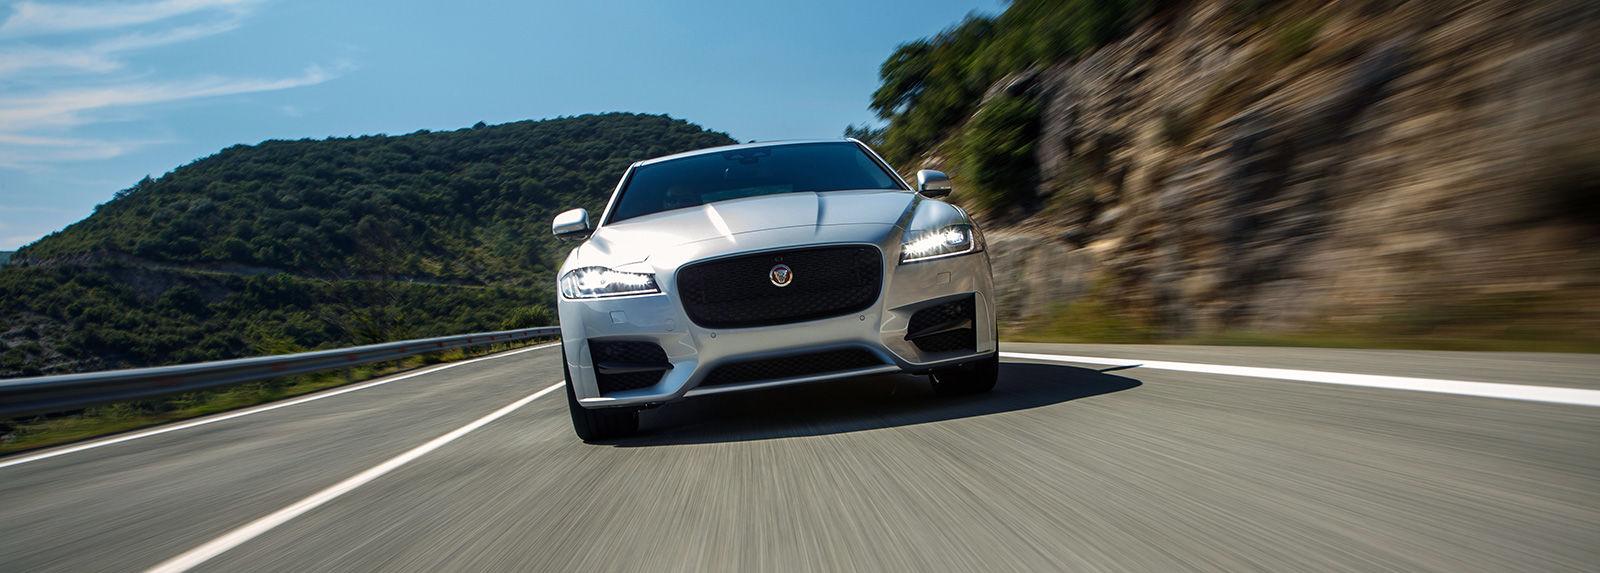 Jaguar xf dimensions 2013